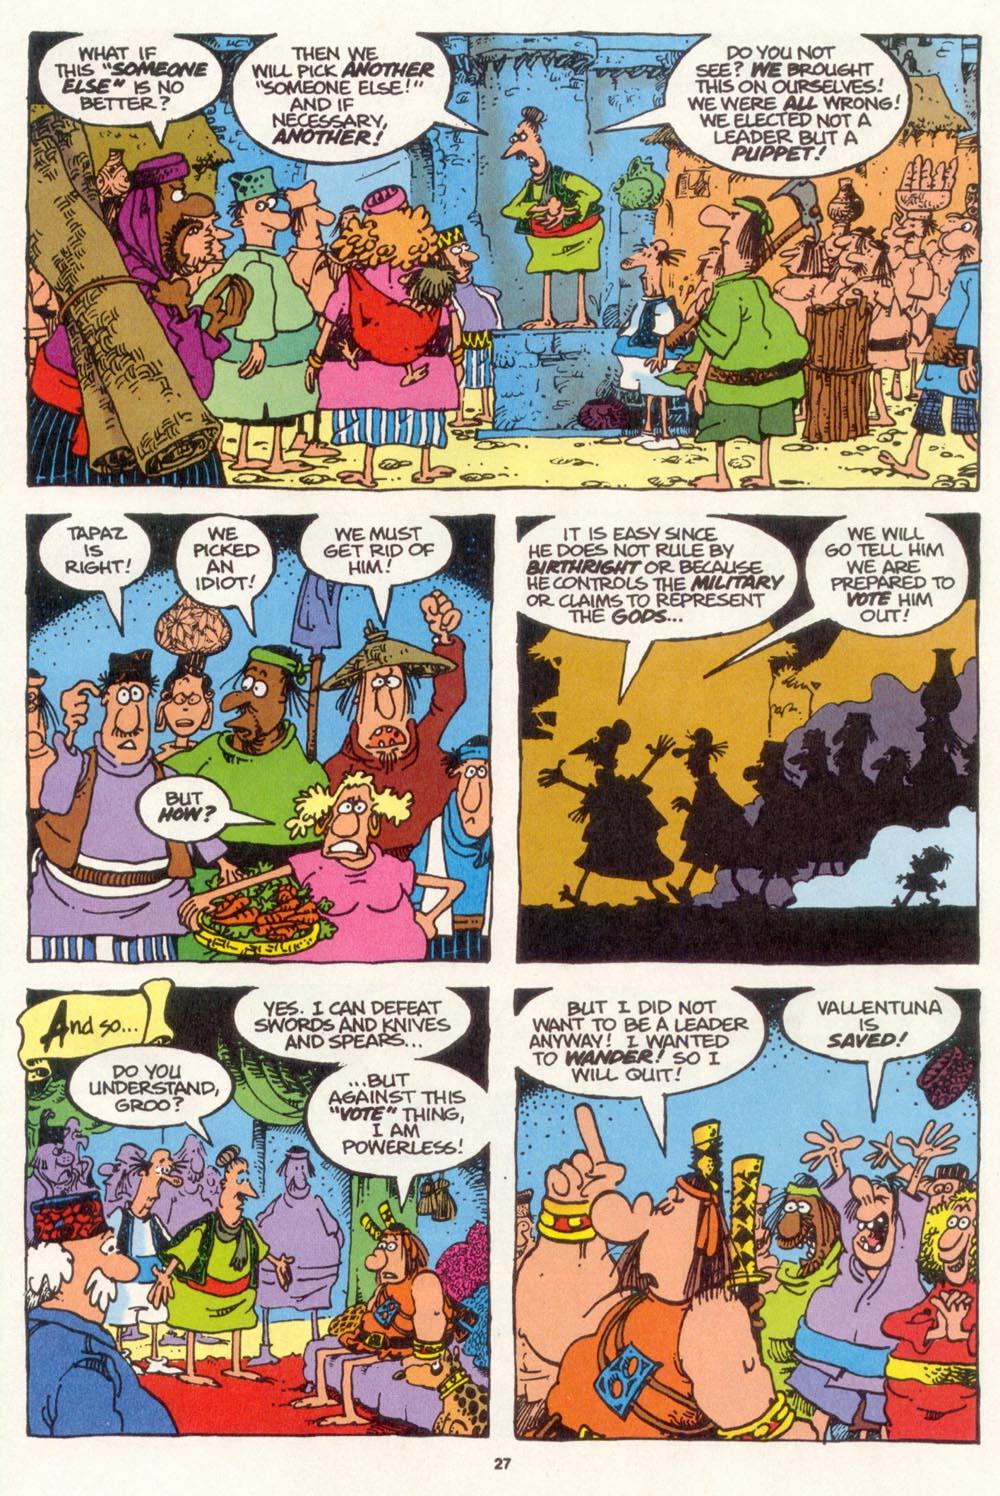 Read online Sergio Aragonés Groo the Wanderer comic -  Issue #109 - 29